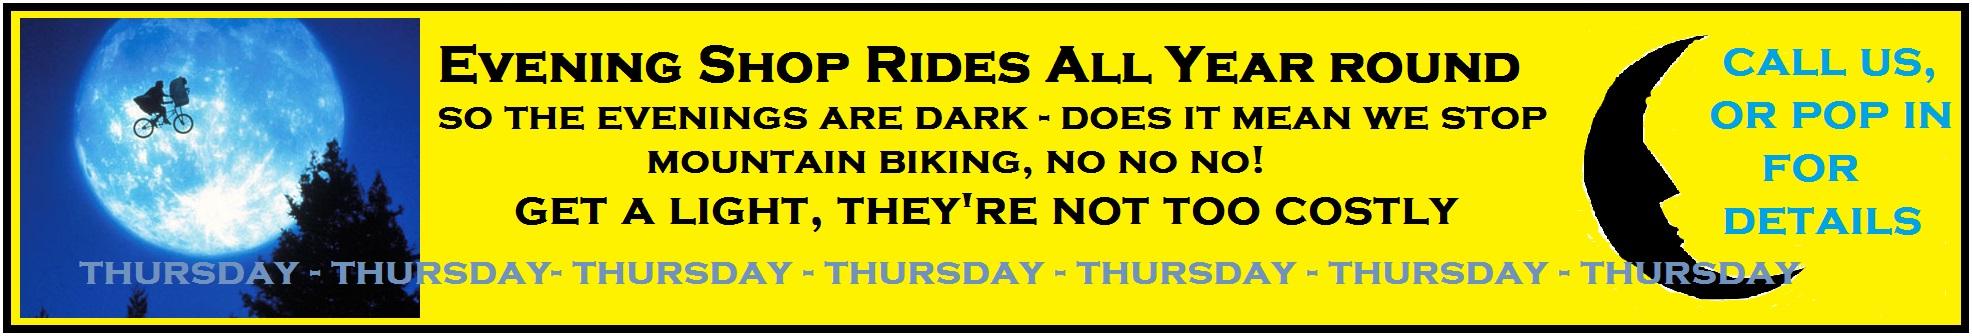 night-ride-banner